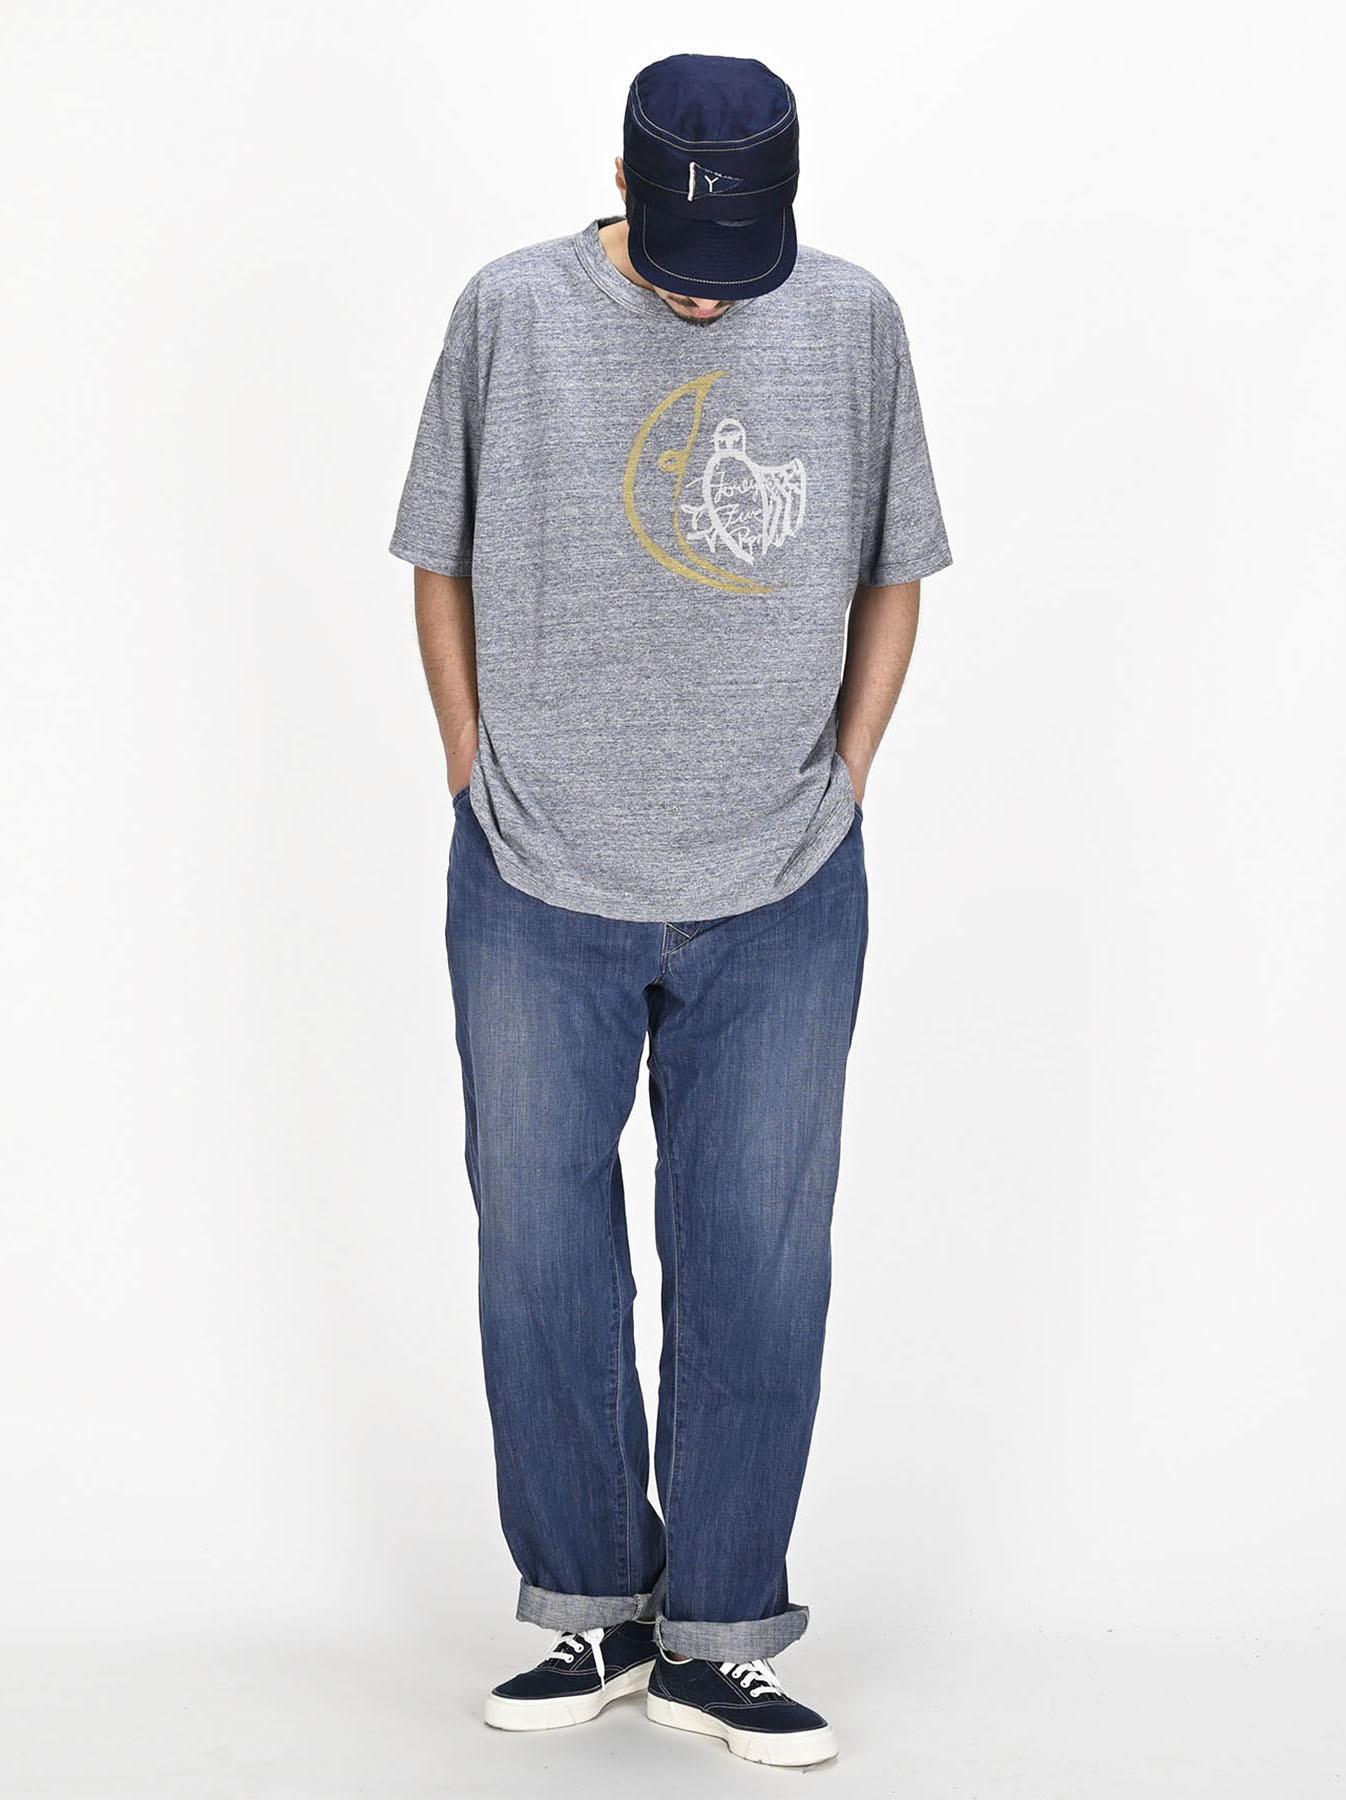 Top Sumite de Owl T-shirt-5